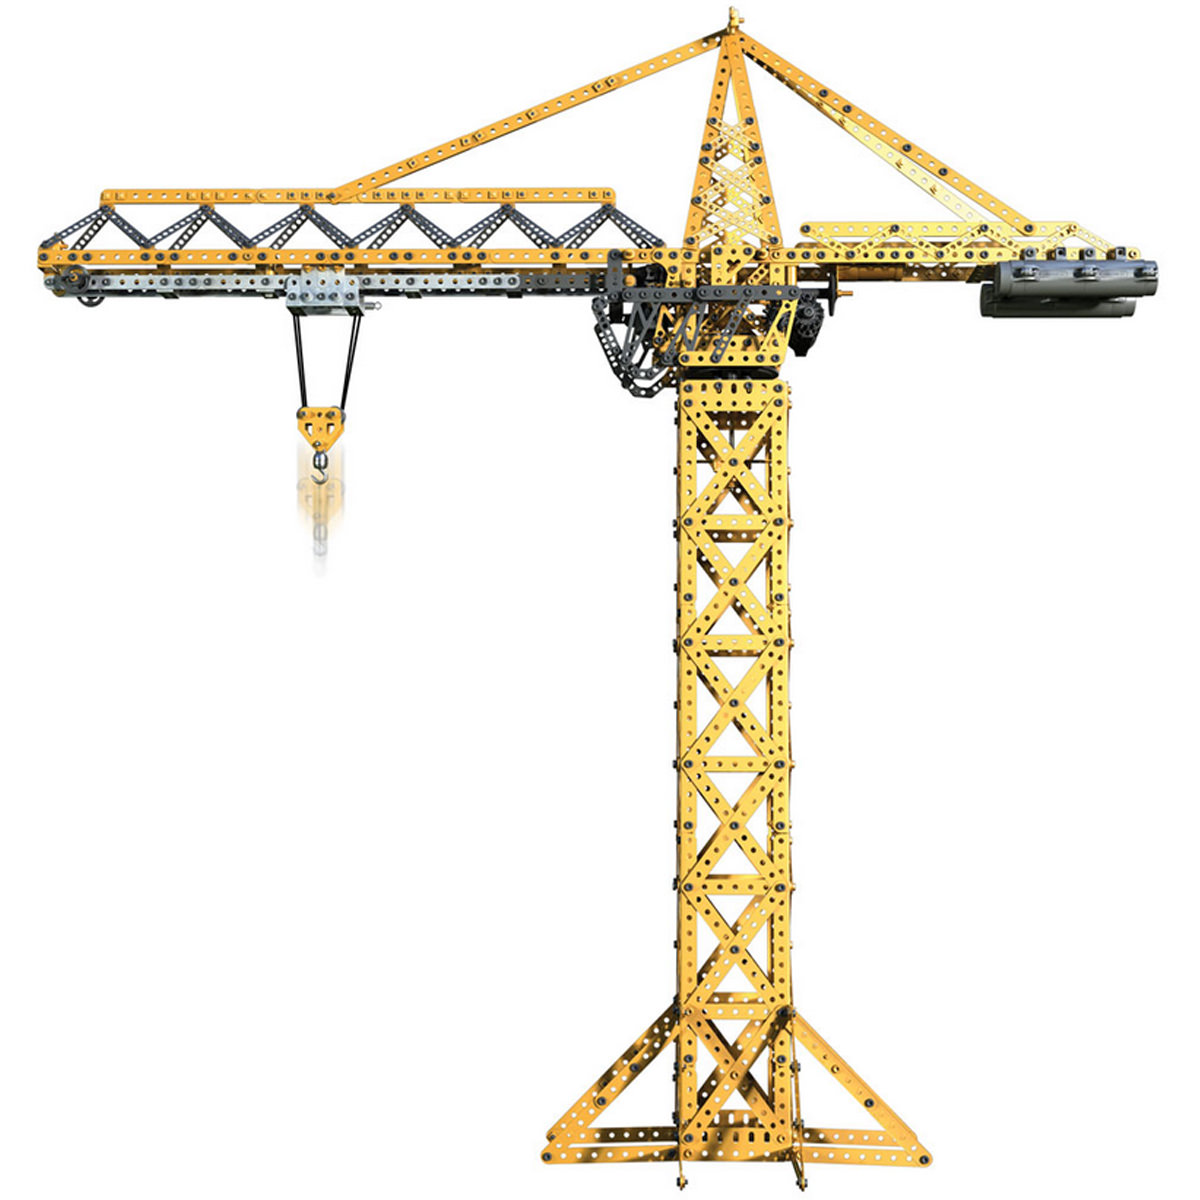 Meccano 15308 Tower Crane At Hobby Warehouse